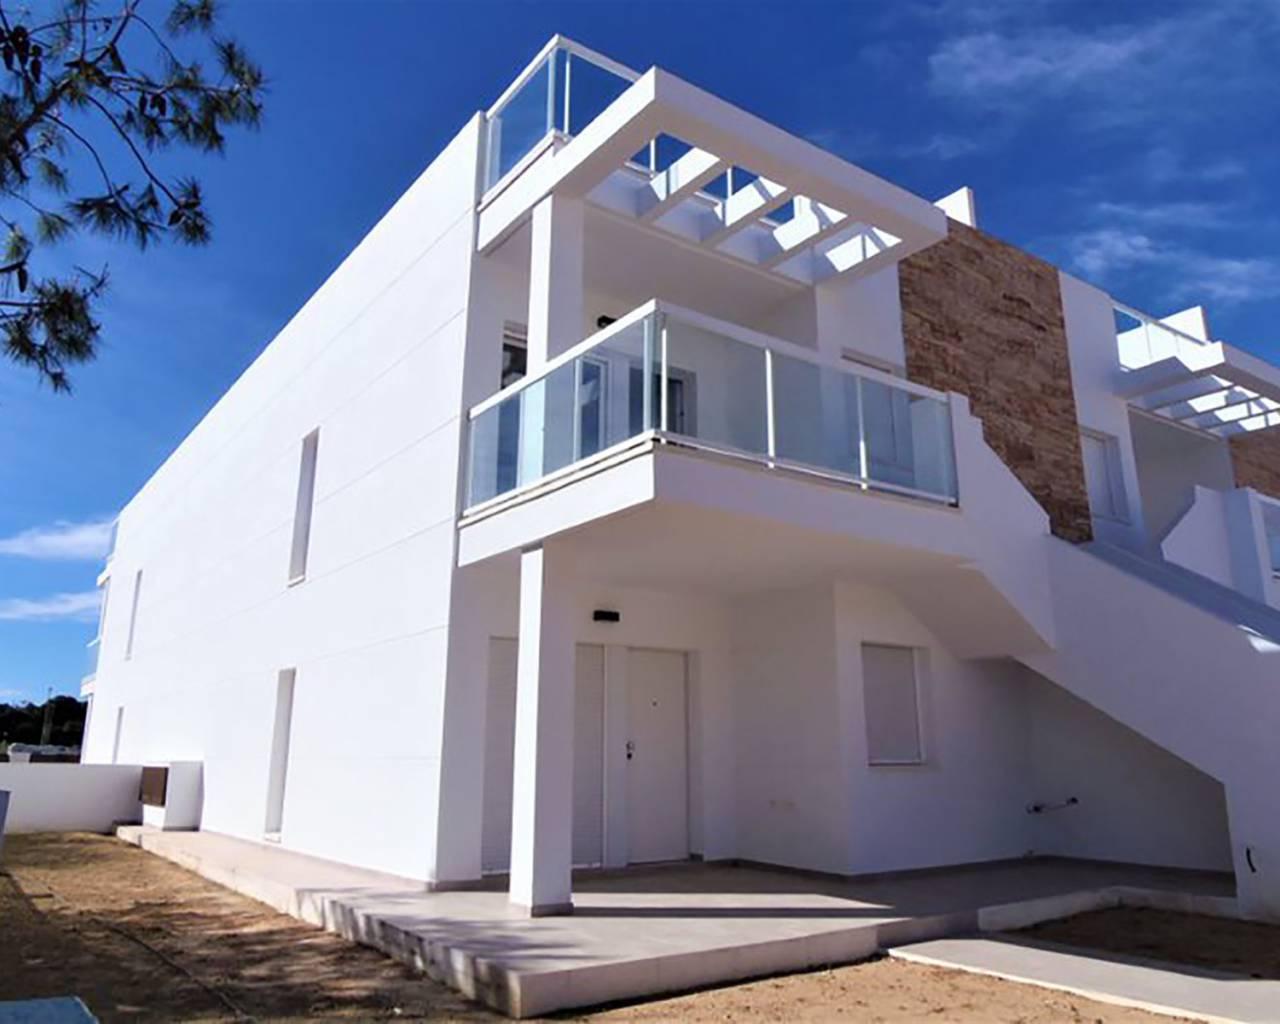 nieuwbouw-appartement-san-pedro-del-pinatar-lo-pagan_2998_xl